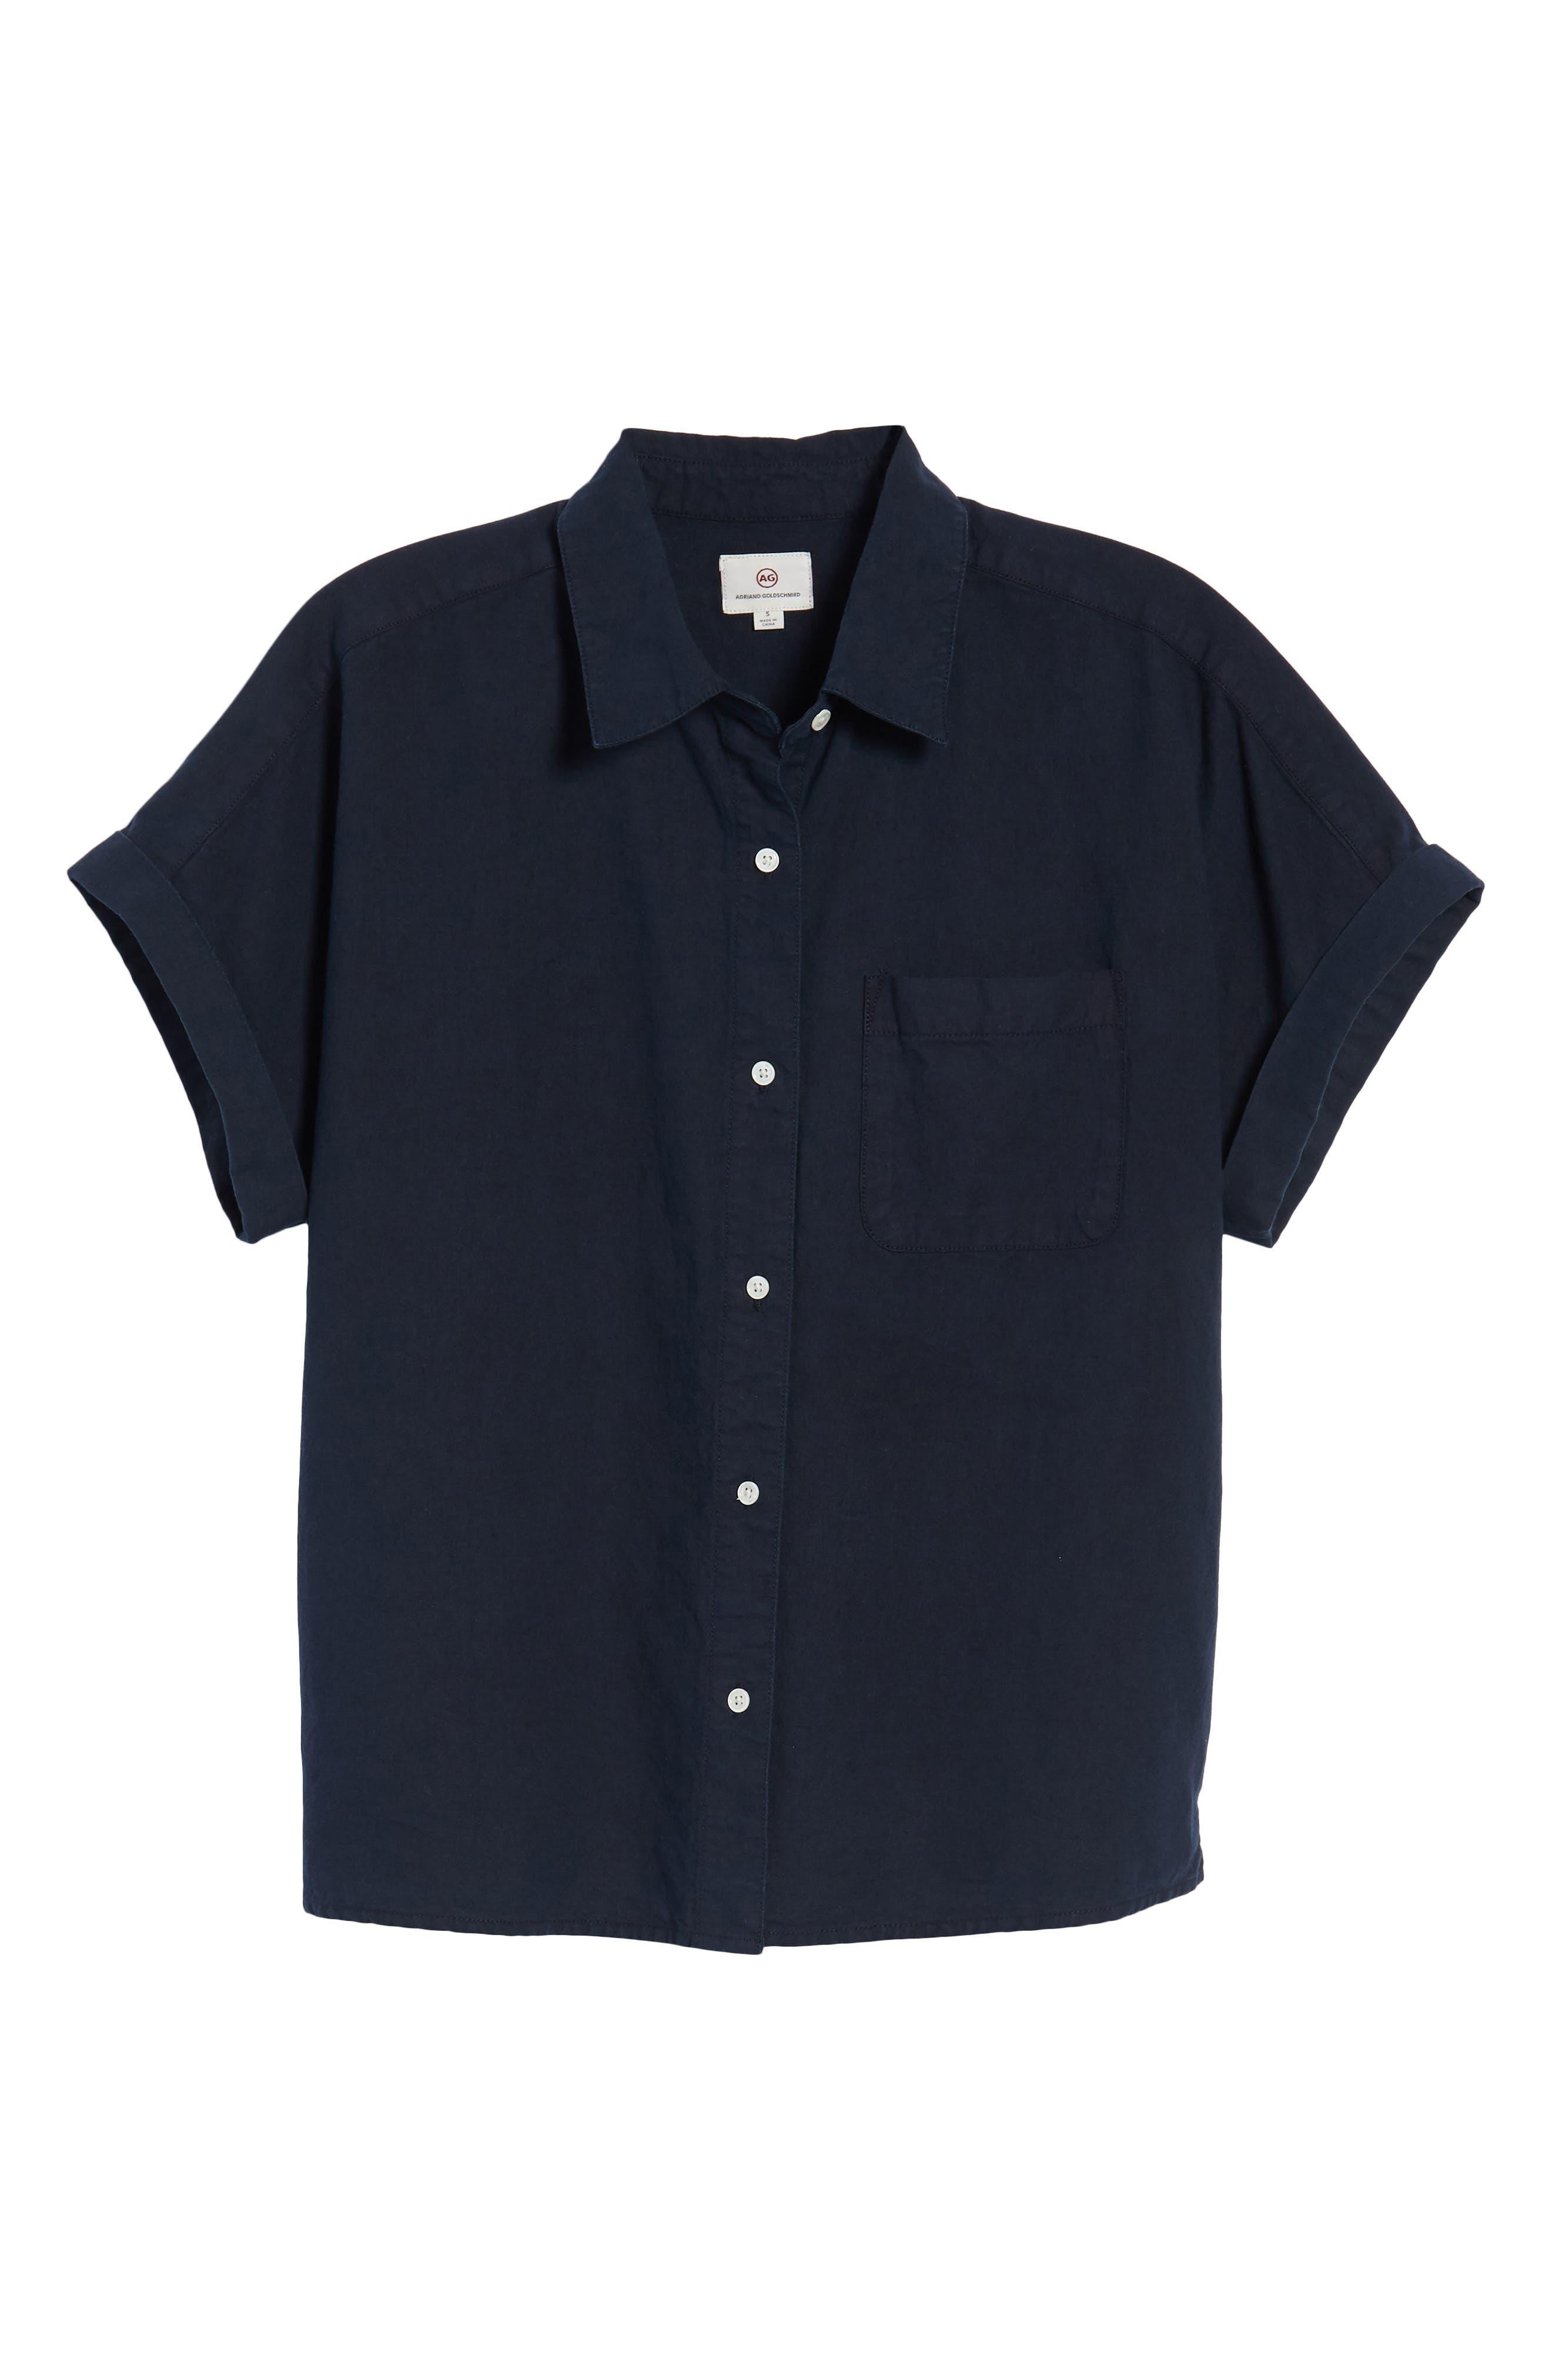 Hadley Shirt,                             Alternate thumbnail 7, color,                             Sulfur Dark Cove